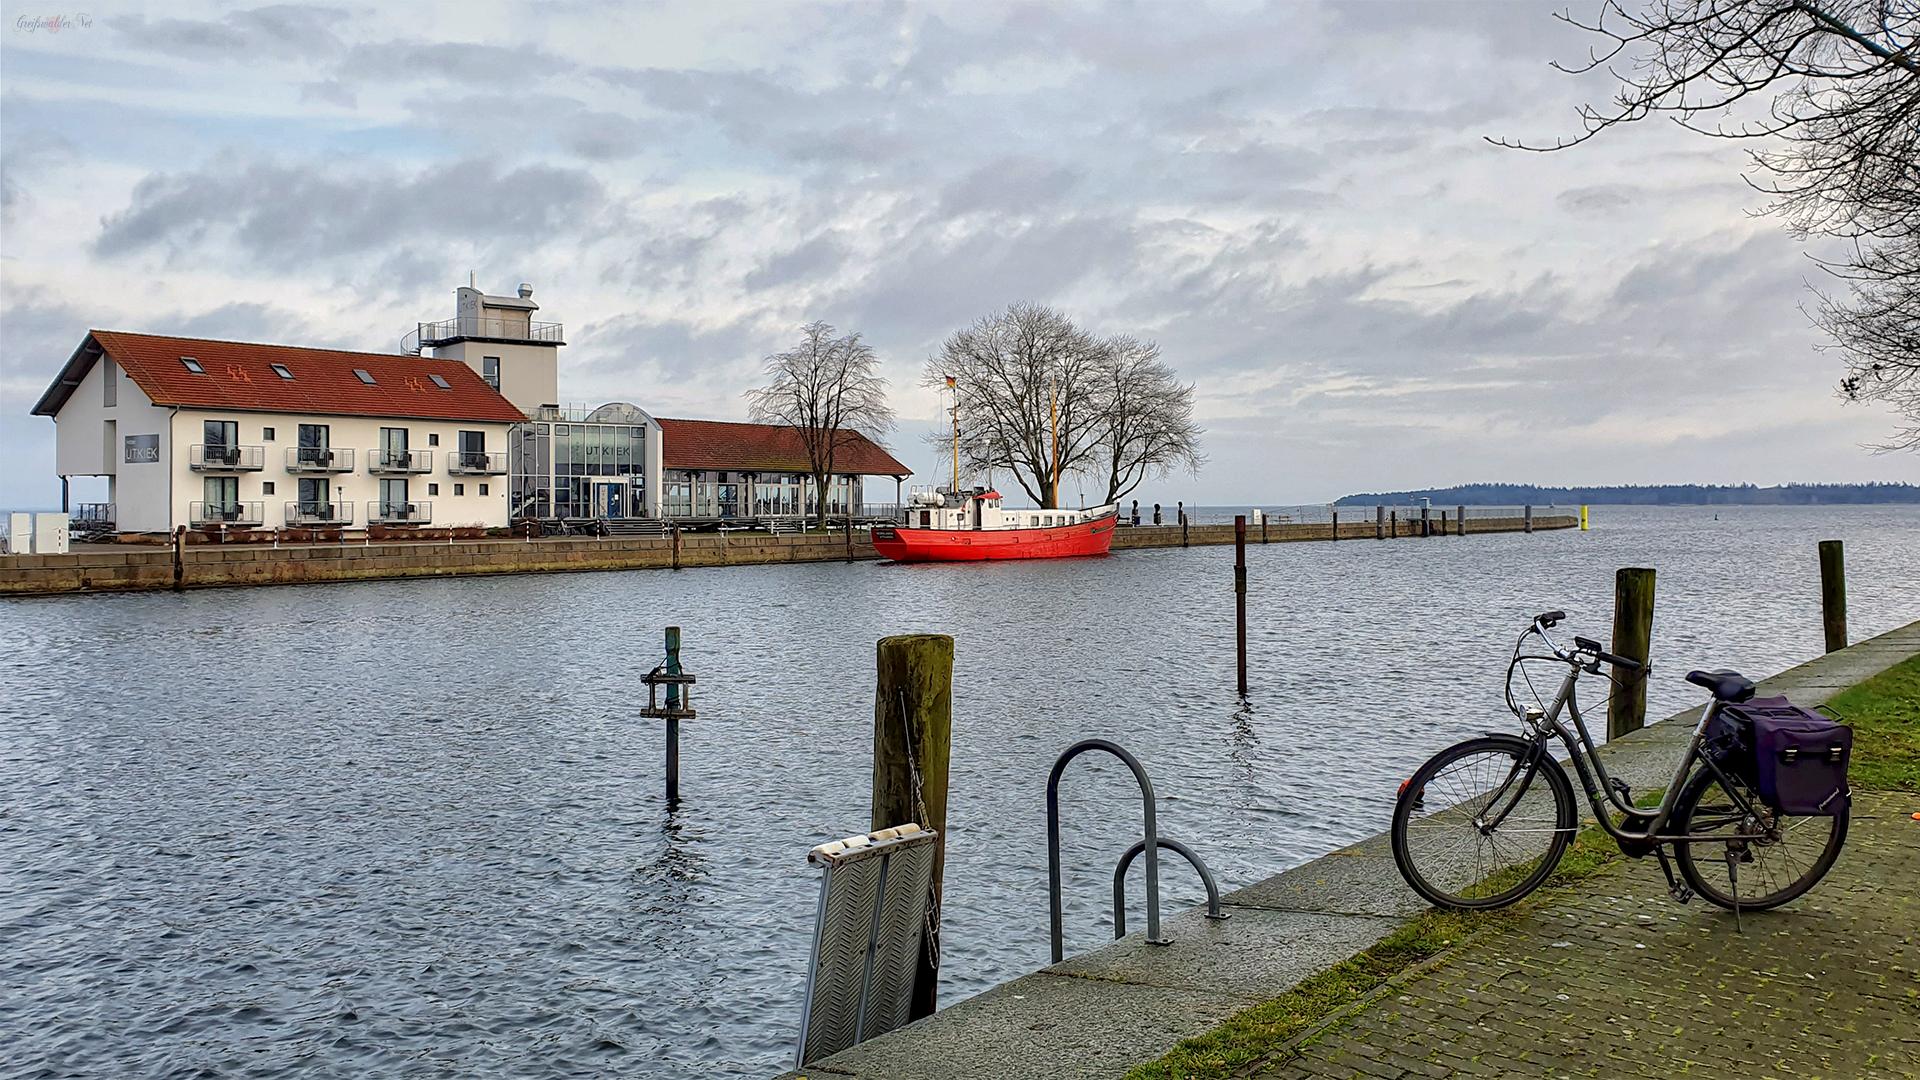 Utkiek und Nordmole in Greifswald-Wieck